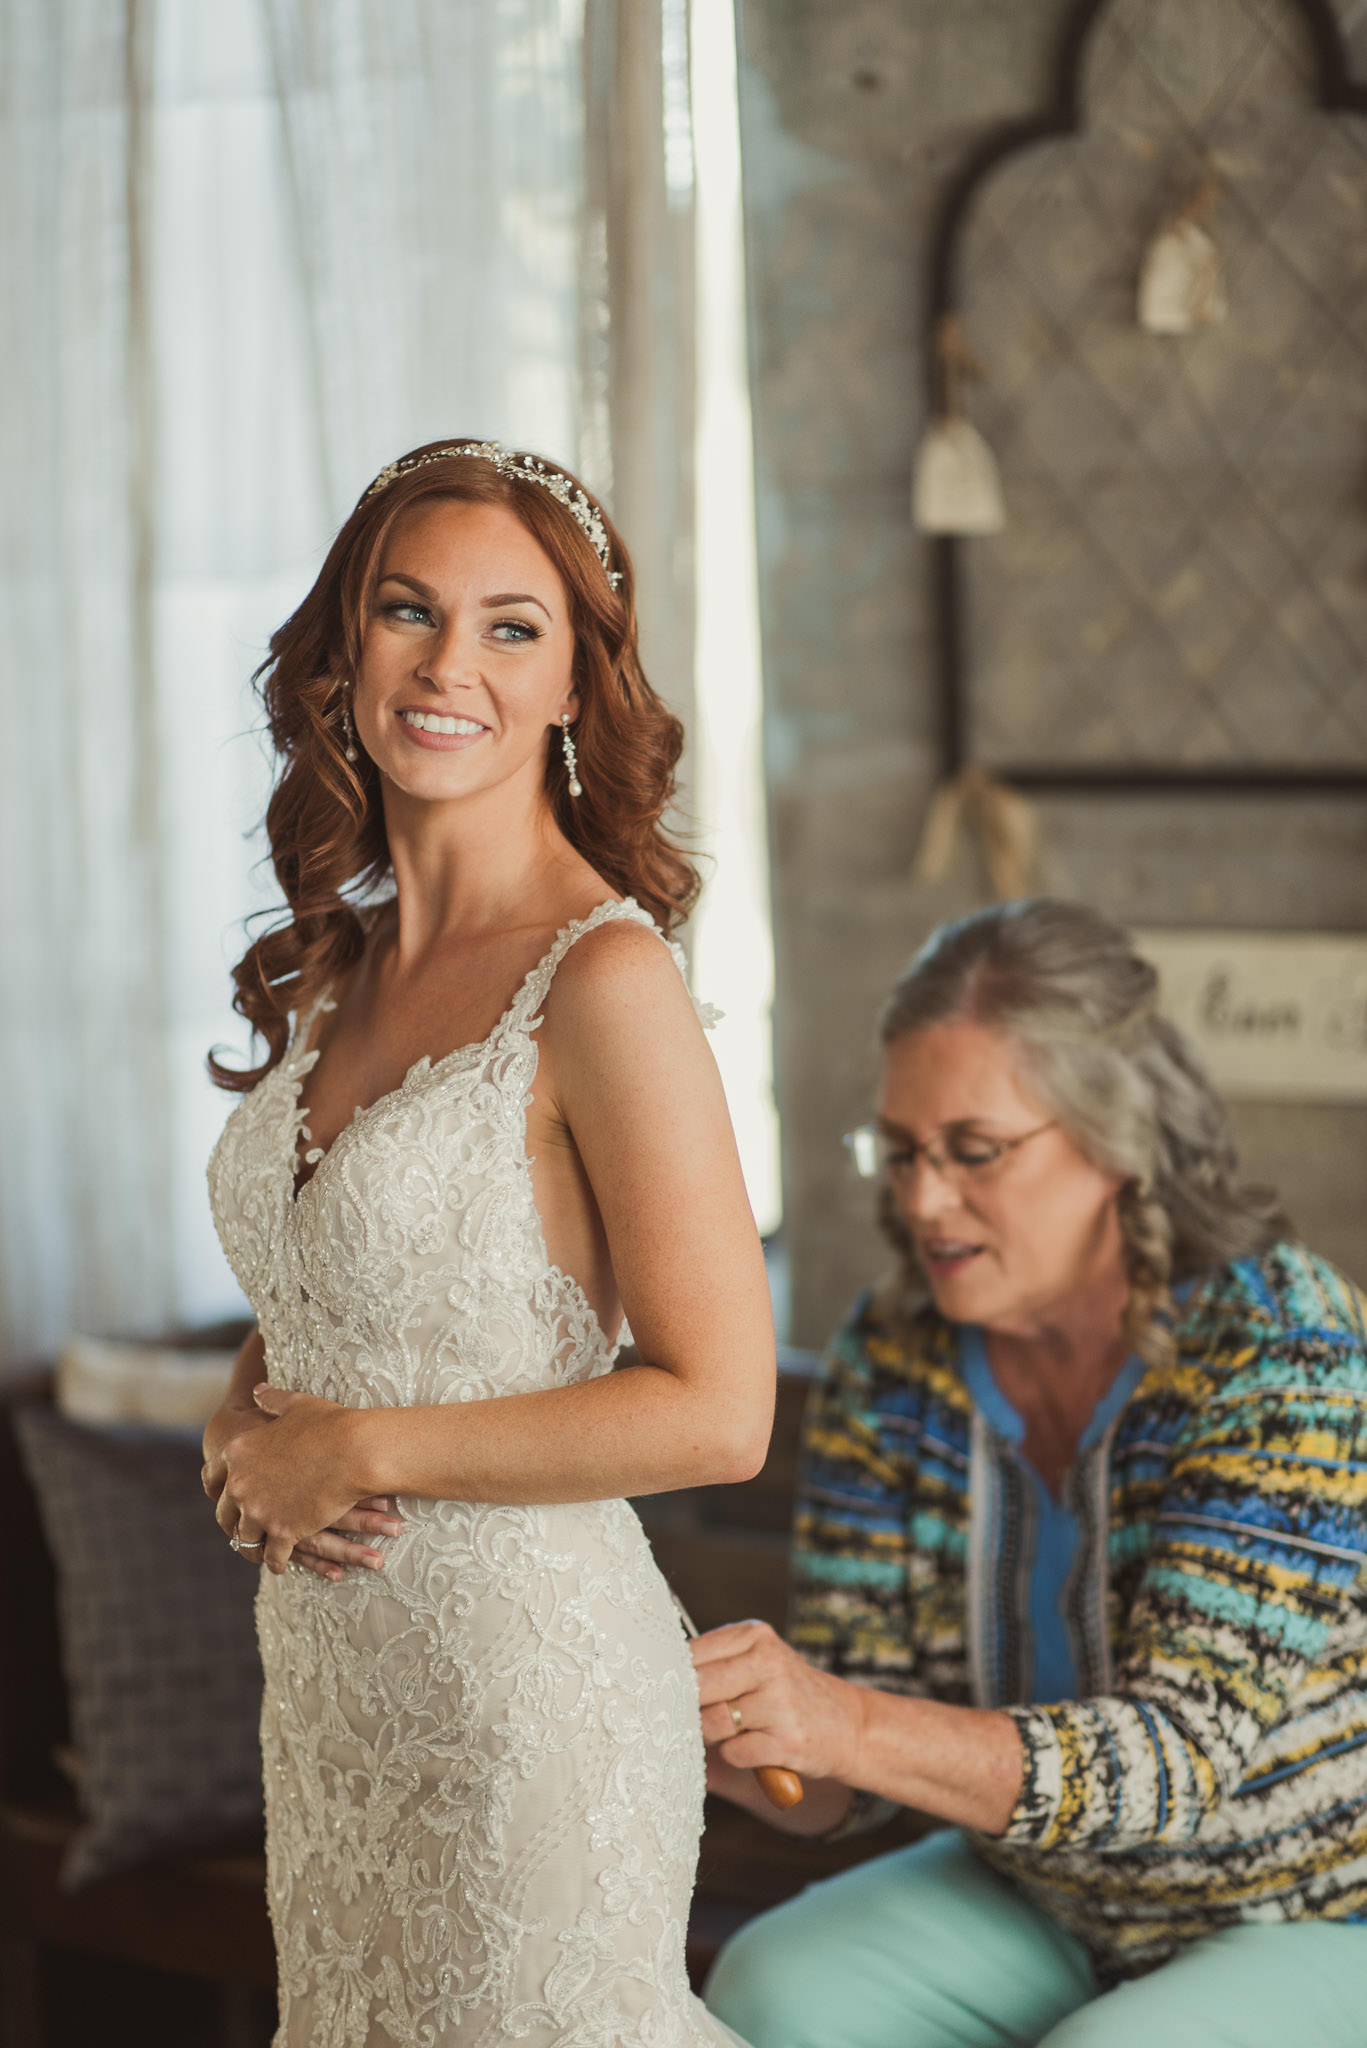 Cynthia-Curtis-Olde-Dobbine-Station-Houston-Wedding-Photographer-sm-31.jpg